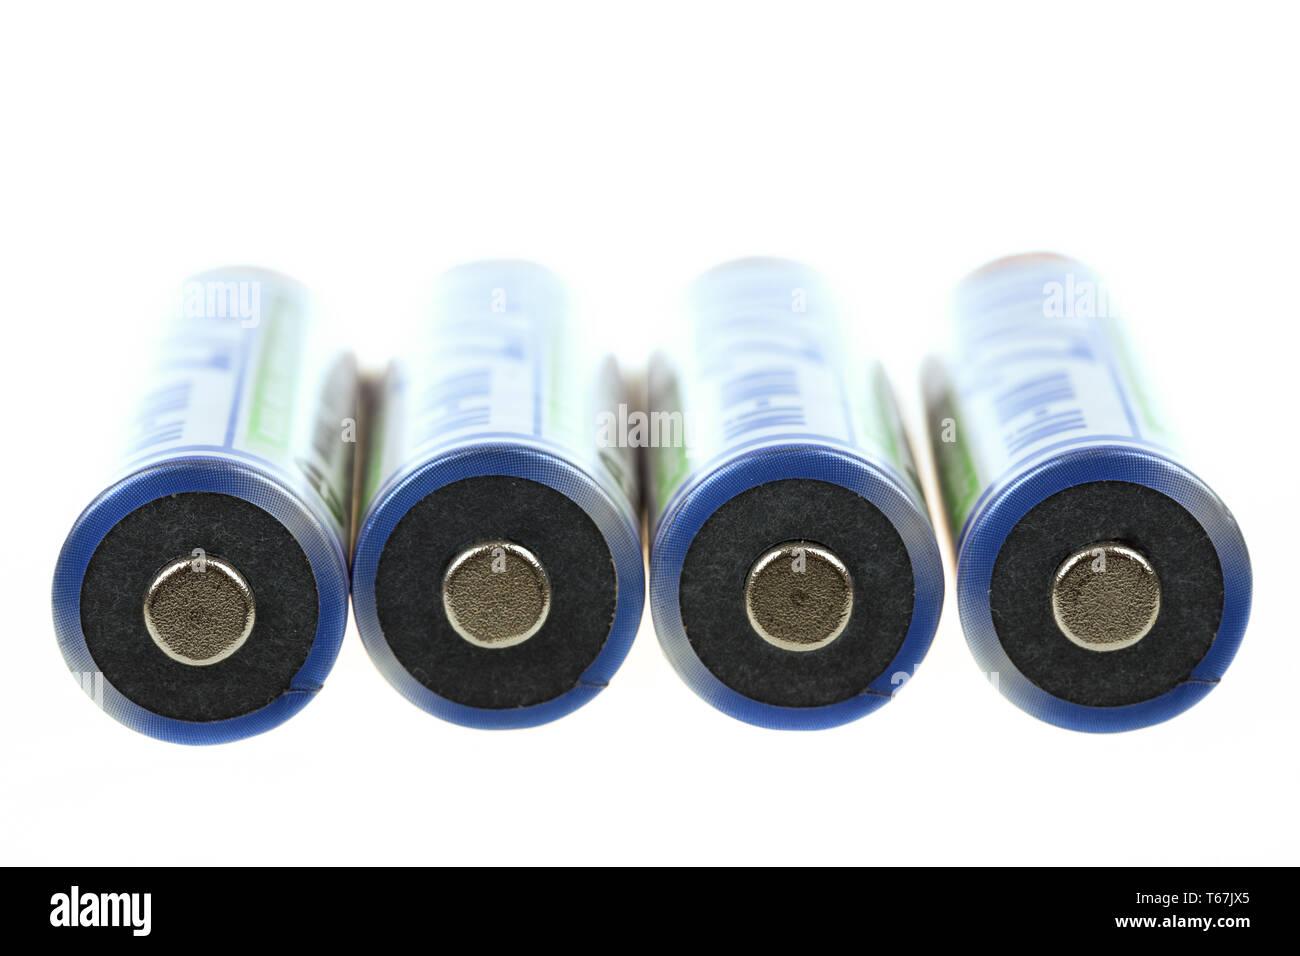 macro of rechargeable NIMH batteries - Stock Image